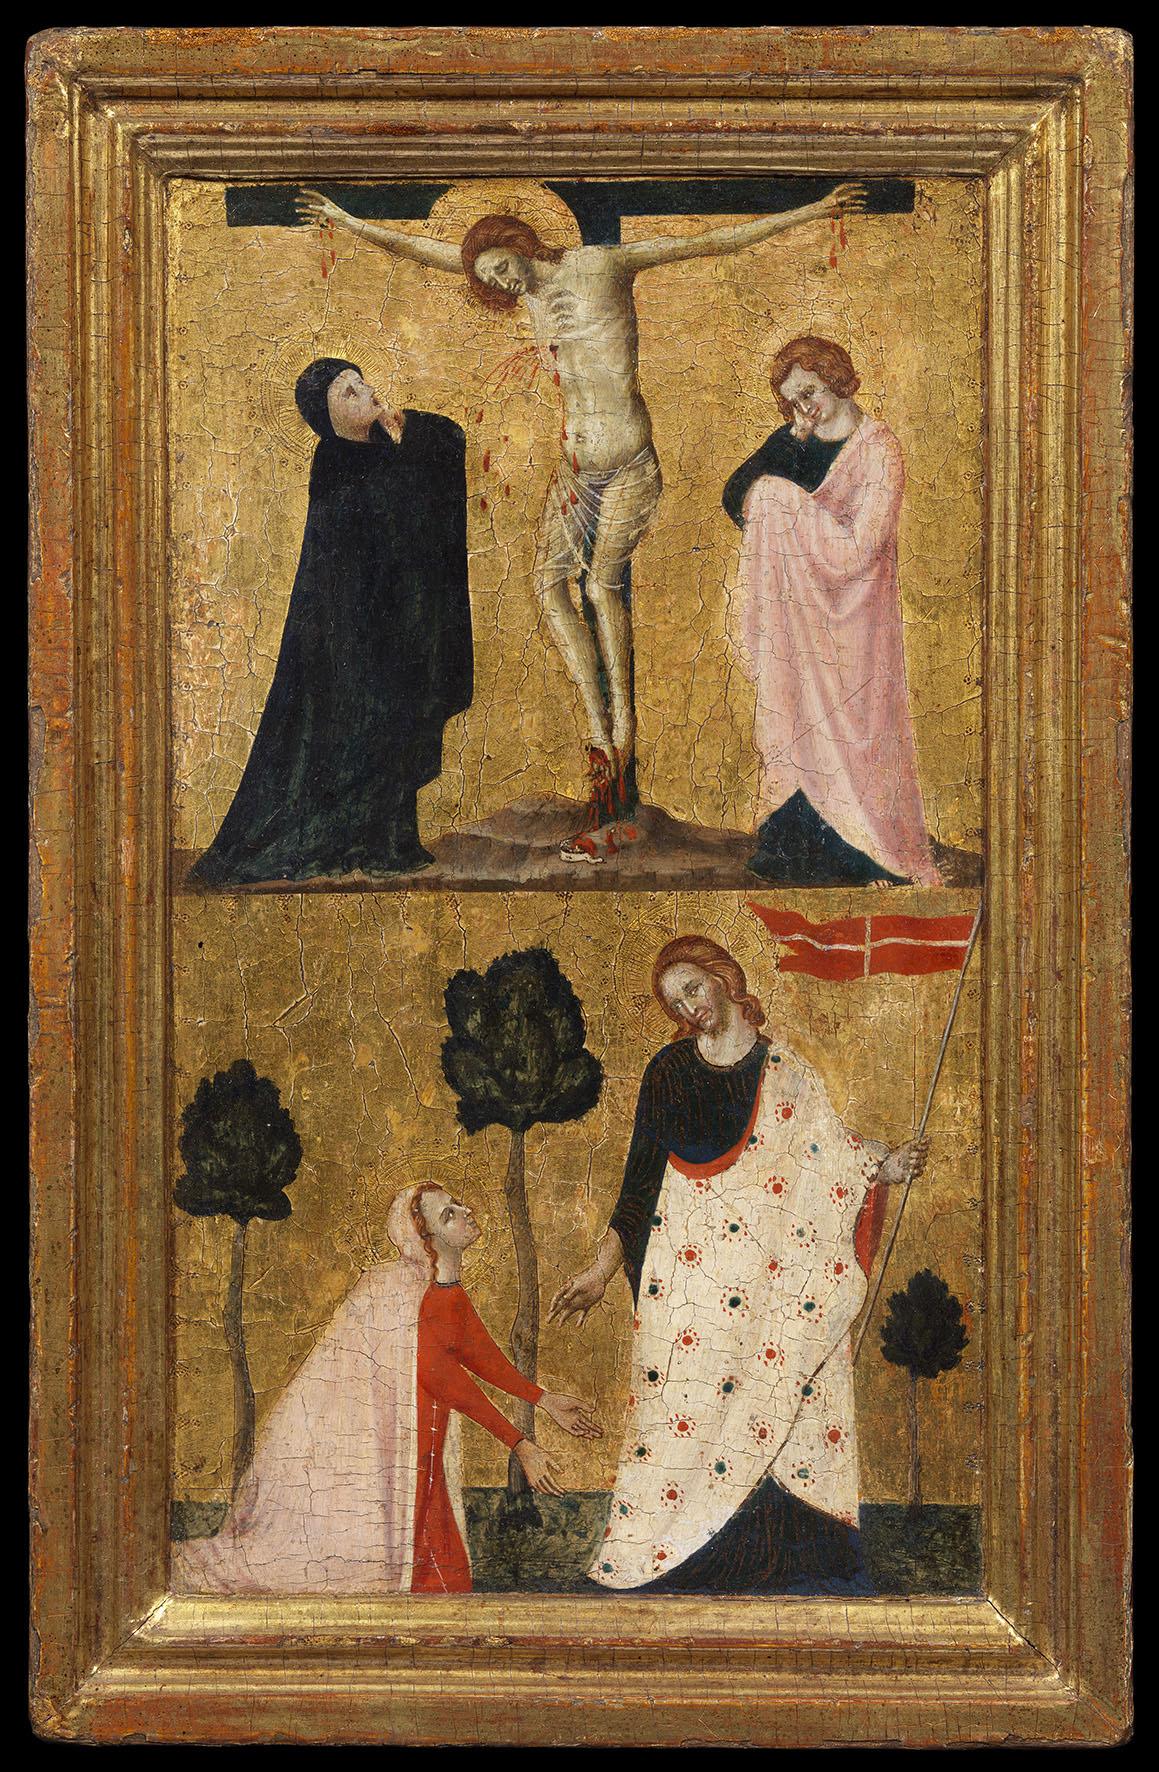 The Crucifixion, Noli Me Tangere, 1330s